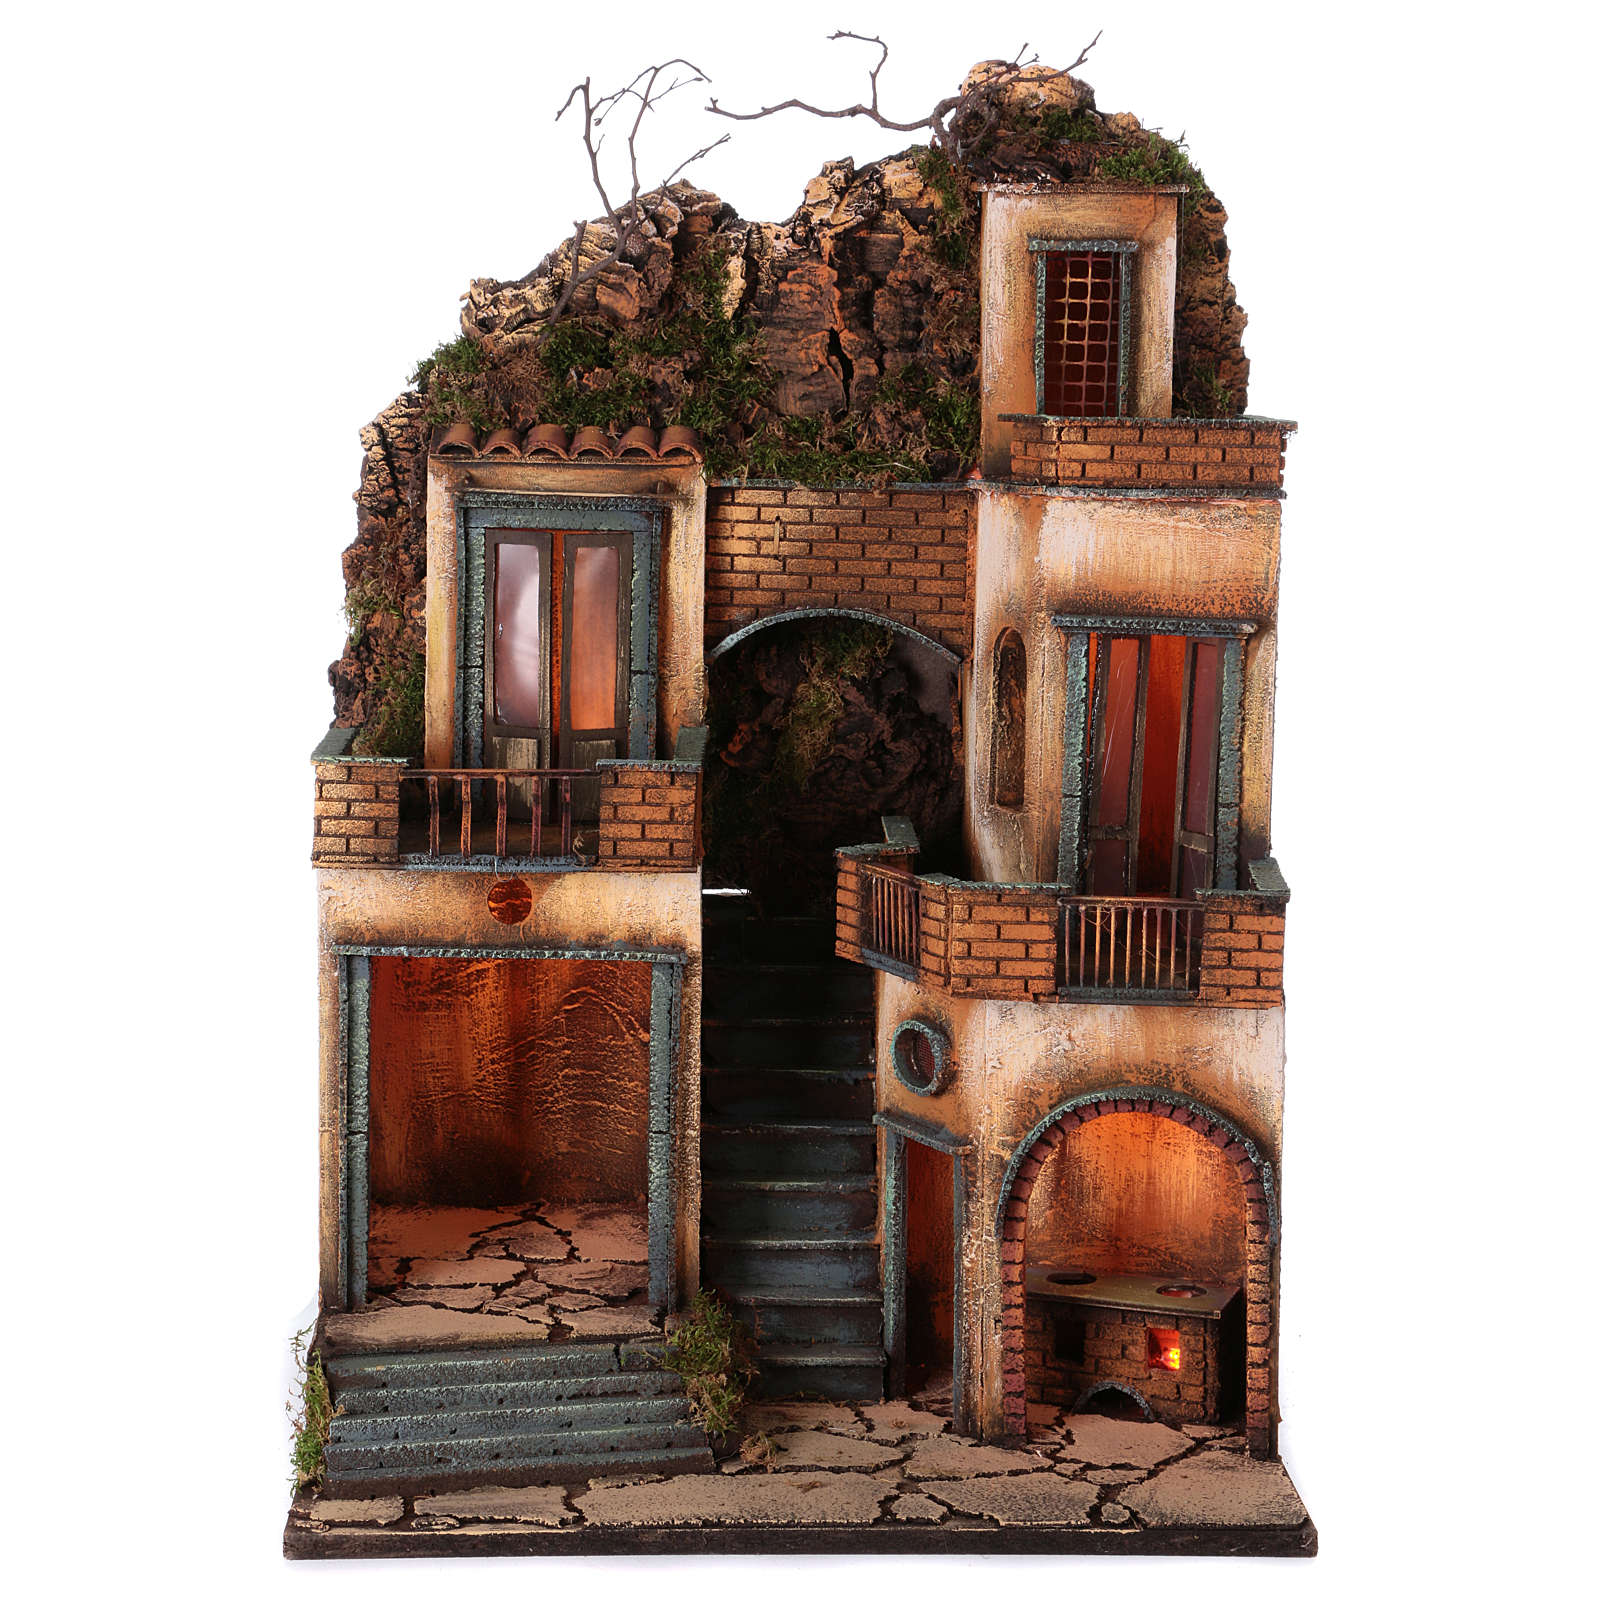 Borgo presepe napoletano scala centrale 66x40x50 cm 4